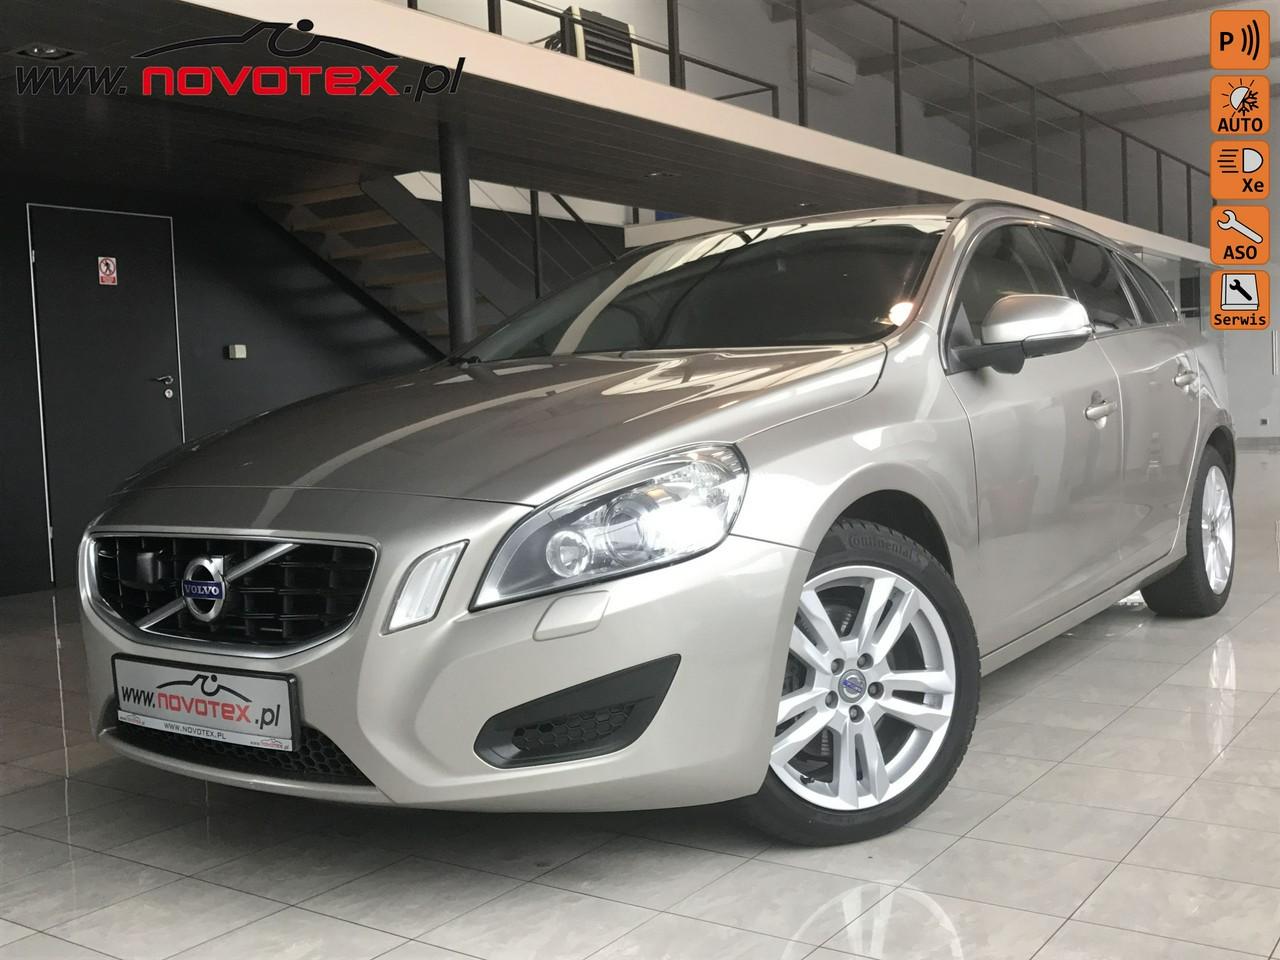 Volvo V60 2.0D*Momentum*xenon*ACC*BLIS*keyless drive*skóra*Gwarancja VIP Service